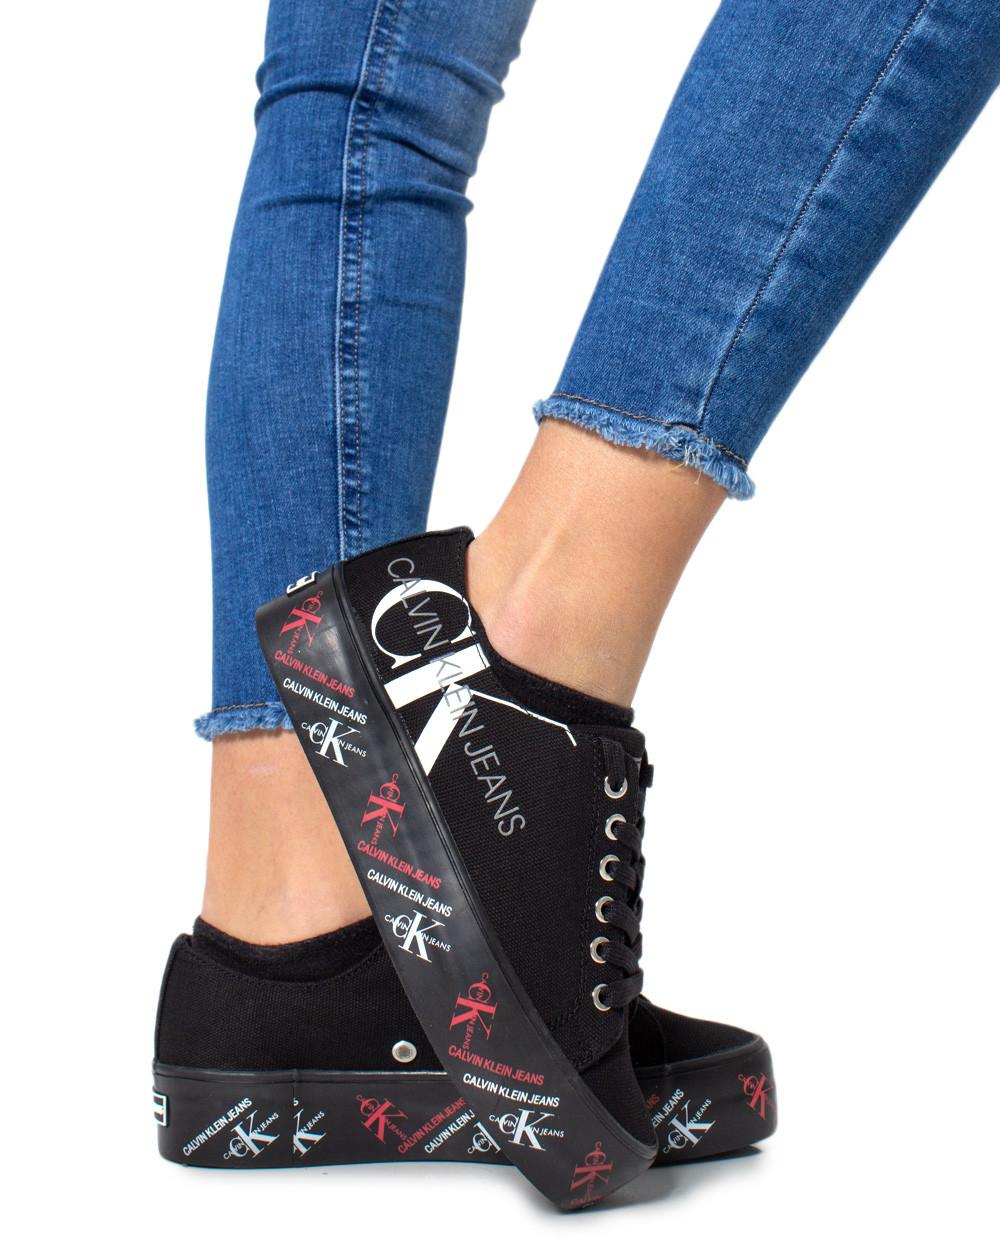 Marchio Calvin Klein Jeans Genere Donna Tipologia Sneakers Stagione Primave…